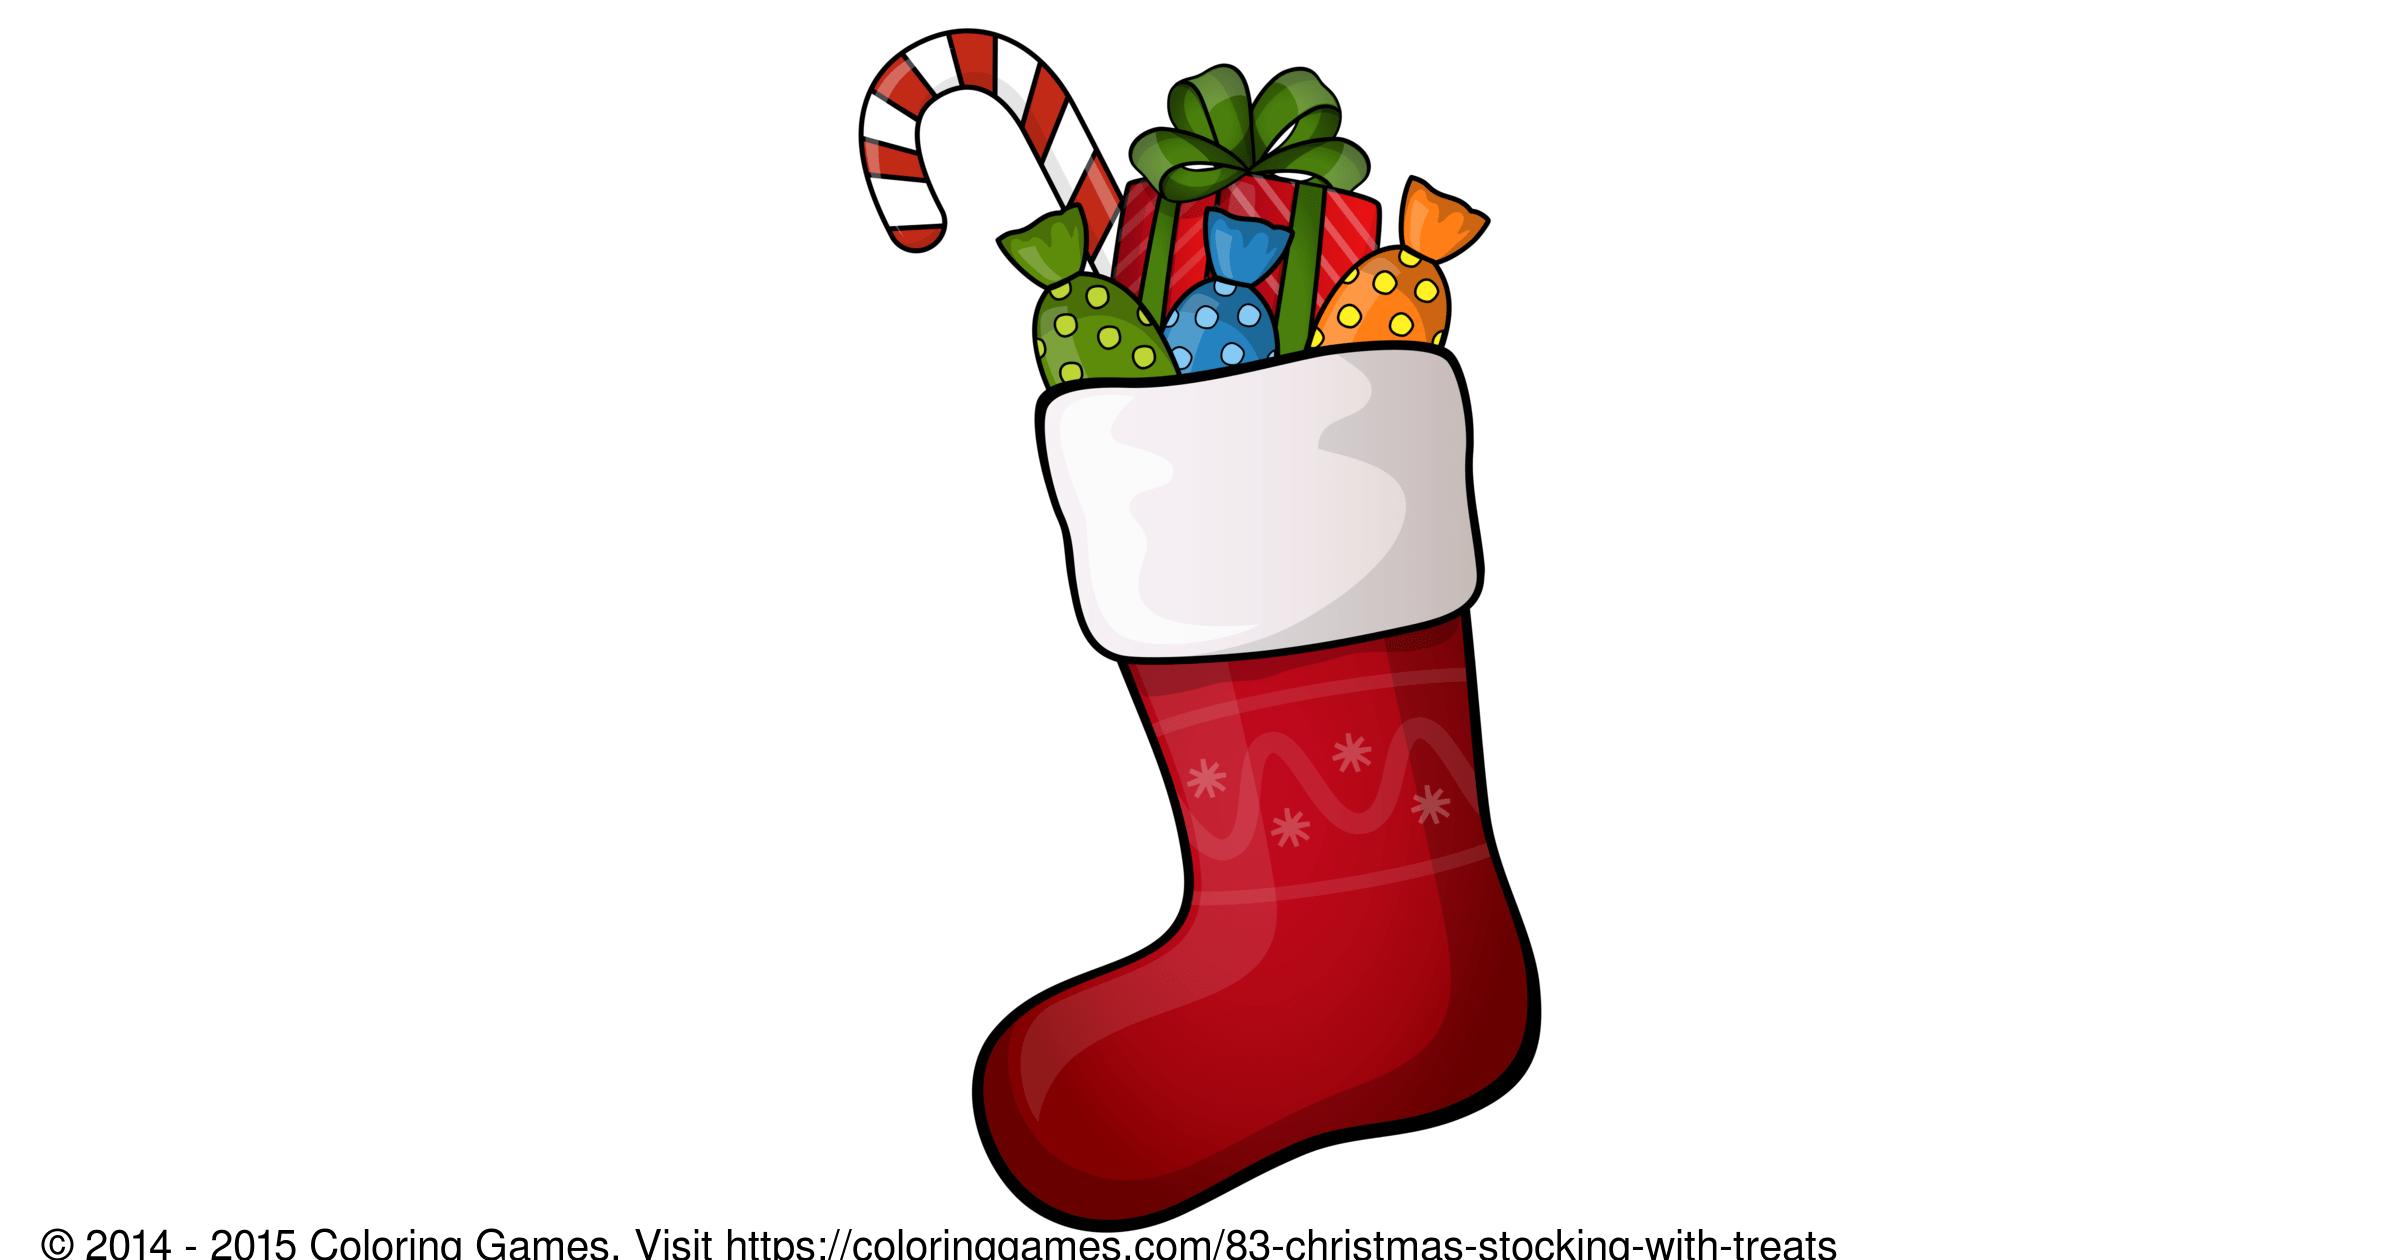 Christmas Stocking With Treats